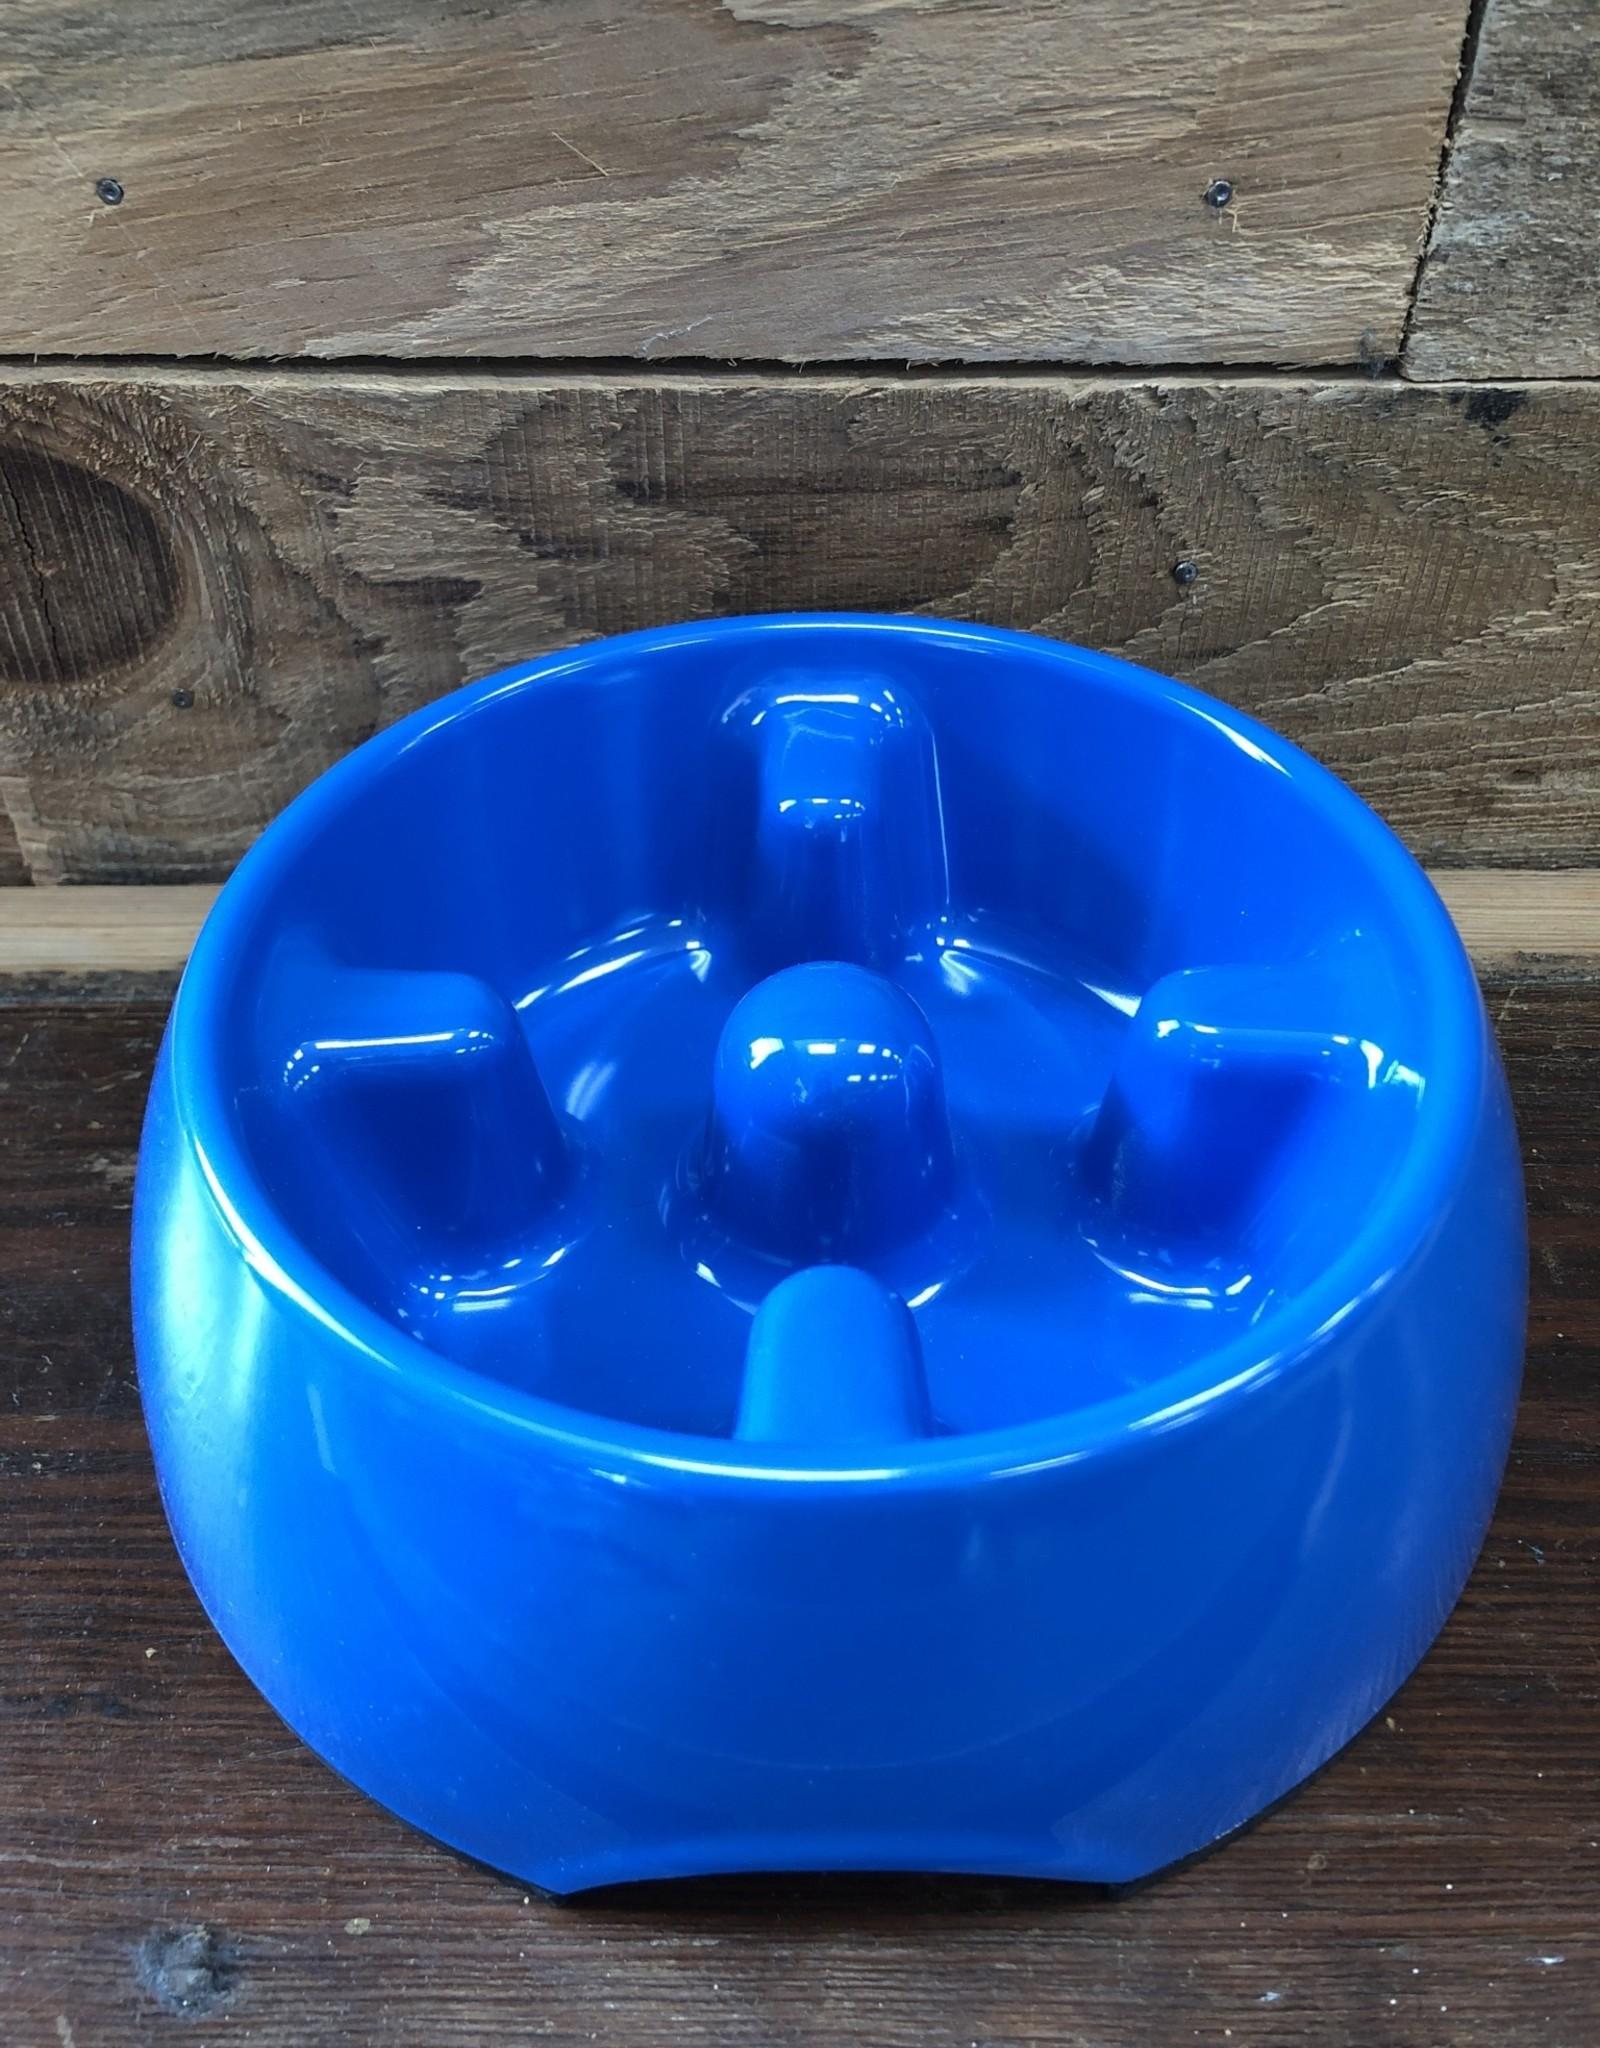 Hagen Dogit Go Slow Anti-Gulping Bowl, Blue, Small